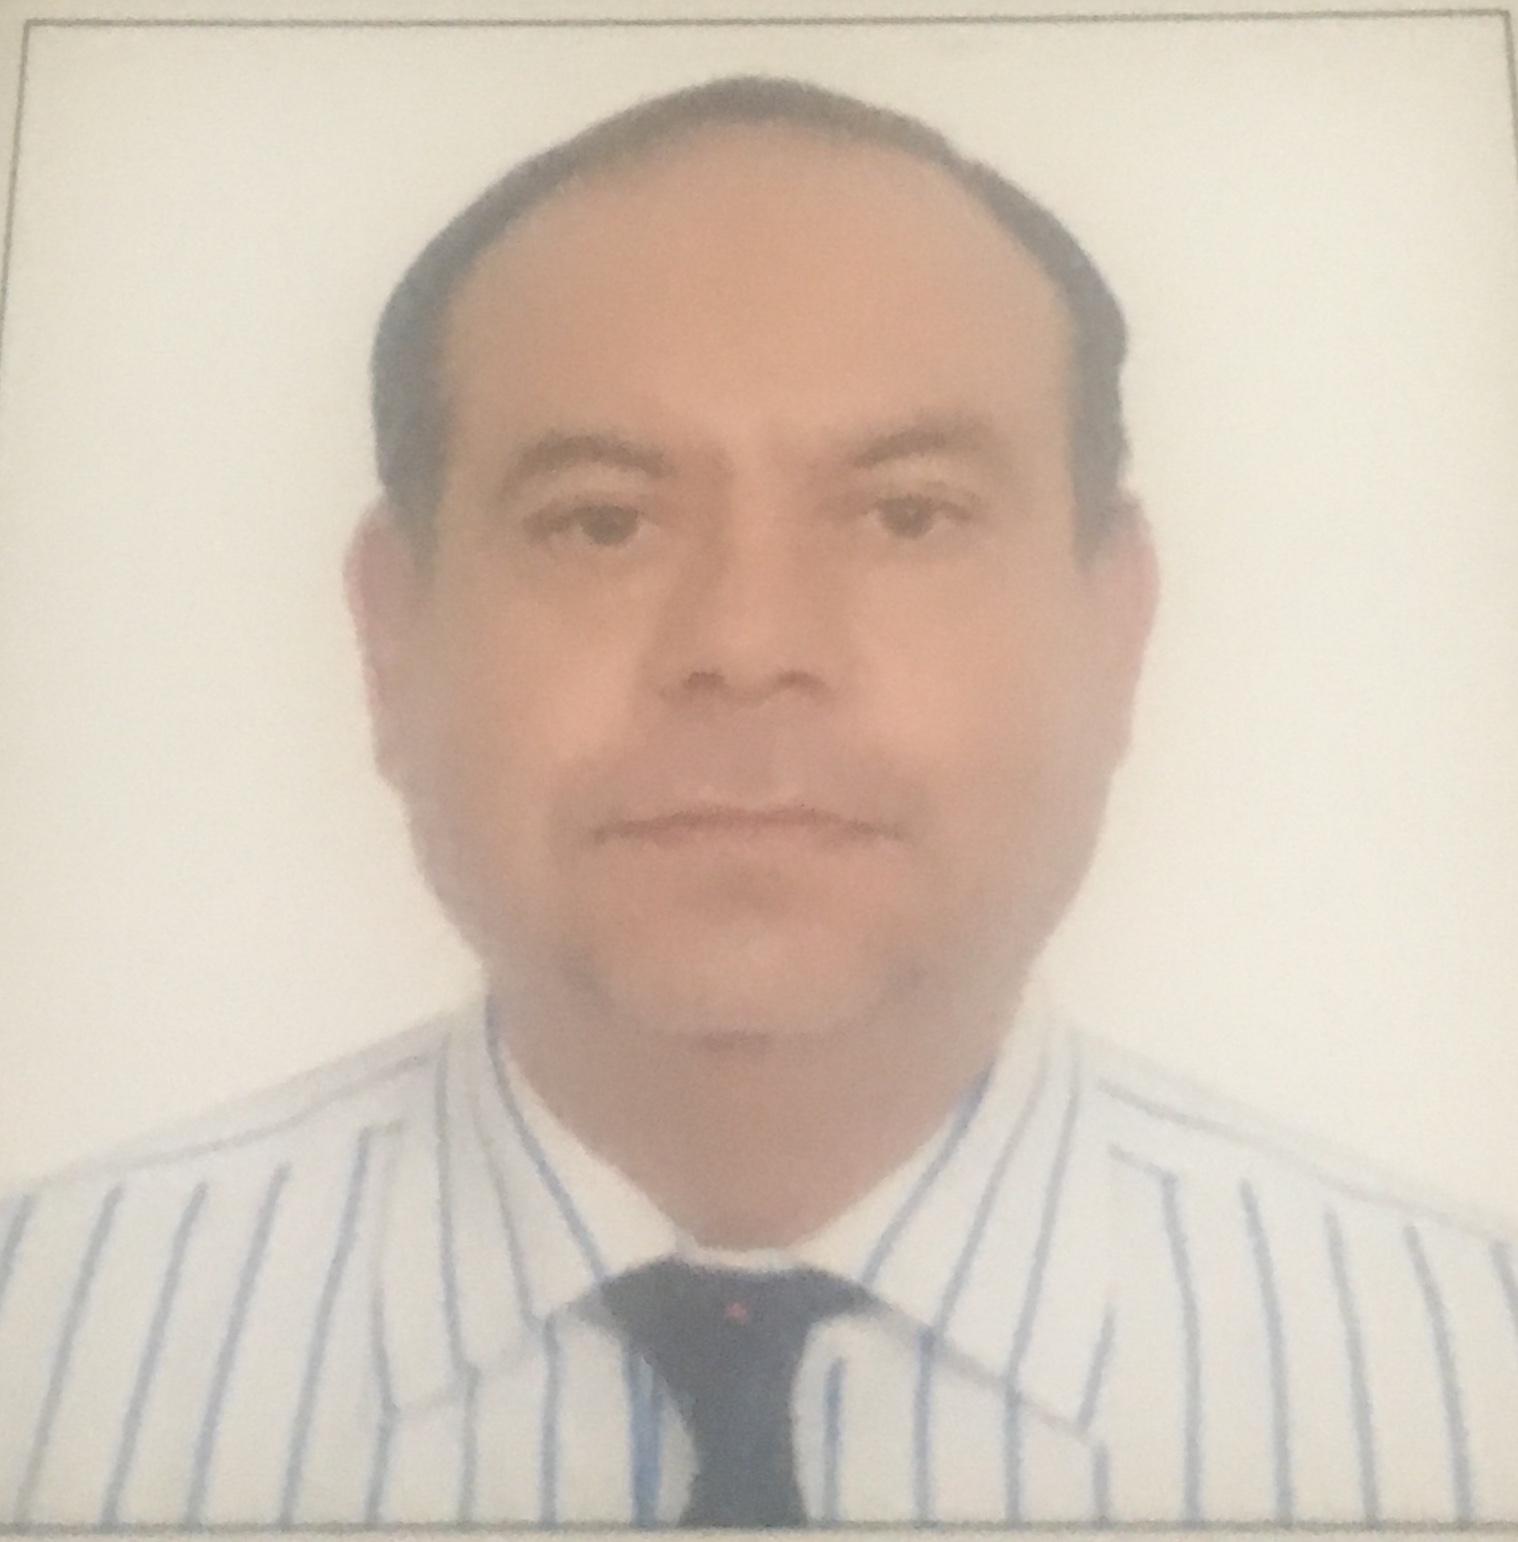 Dr. Hafez Ghanam